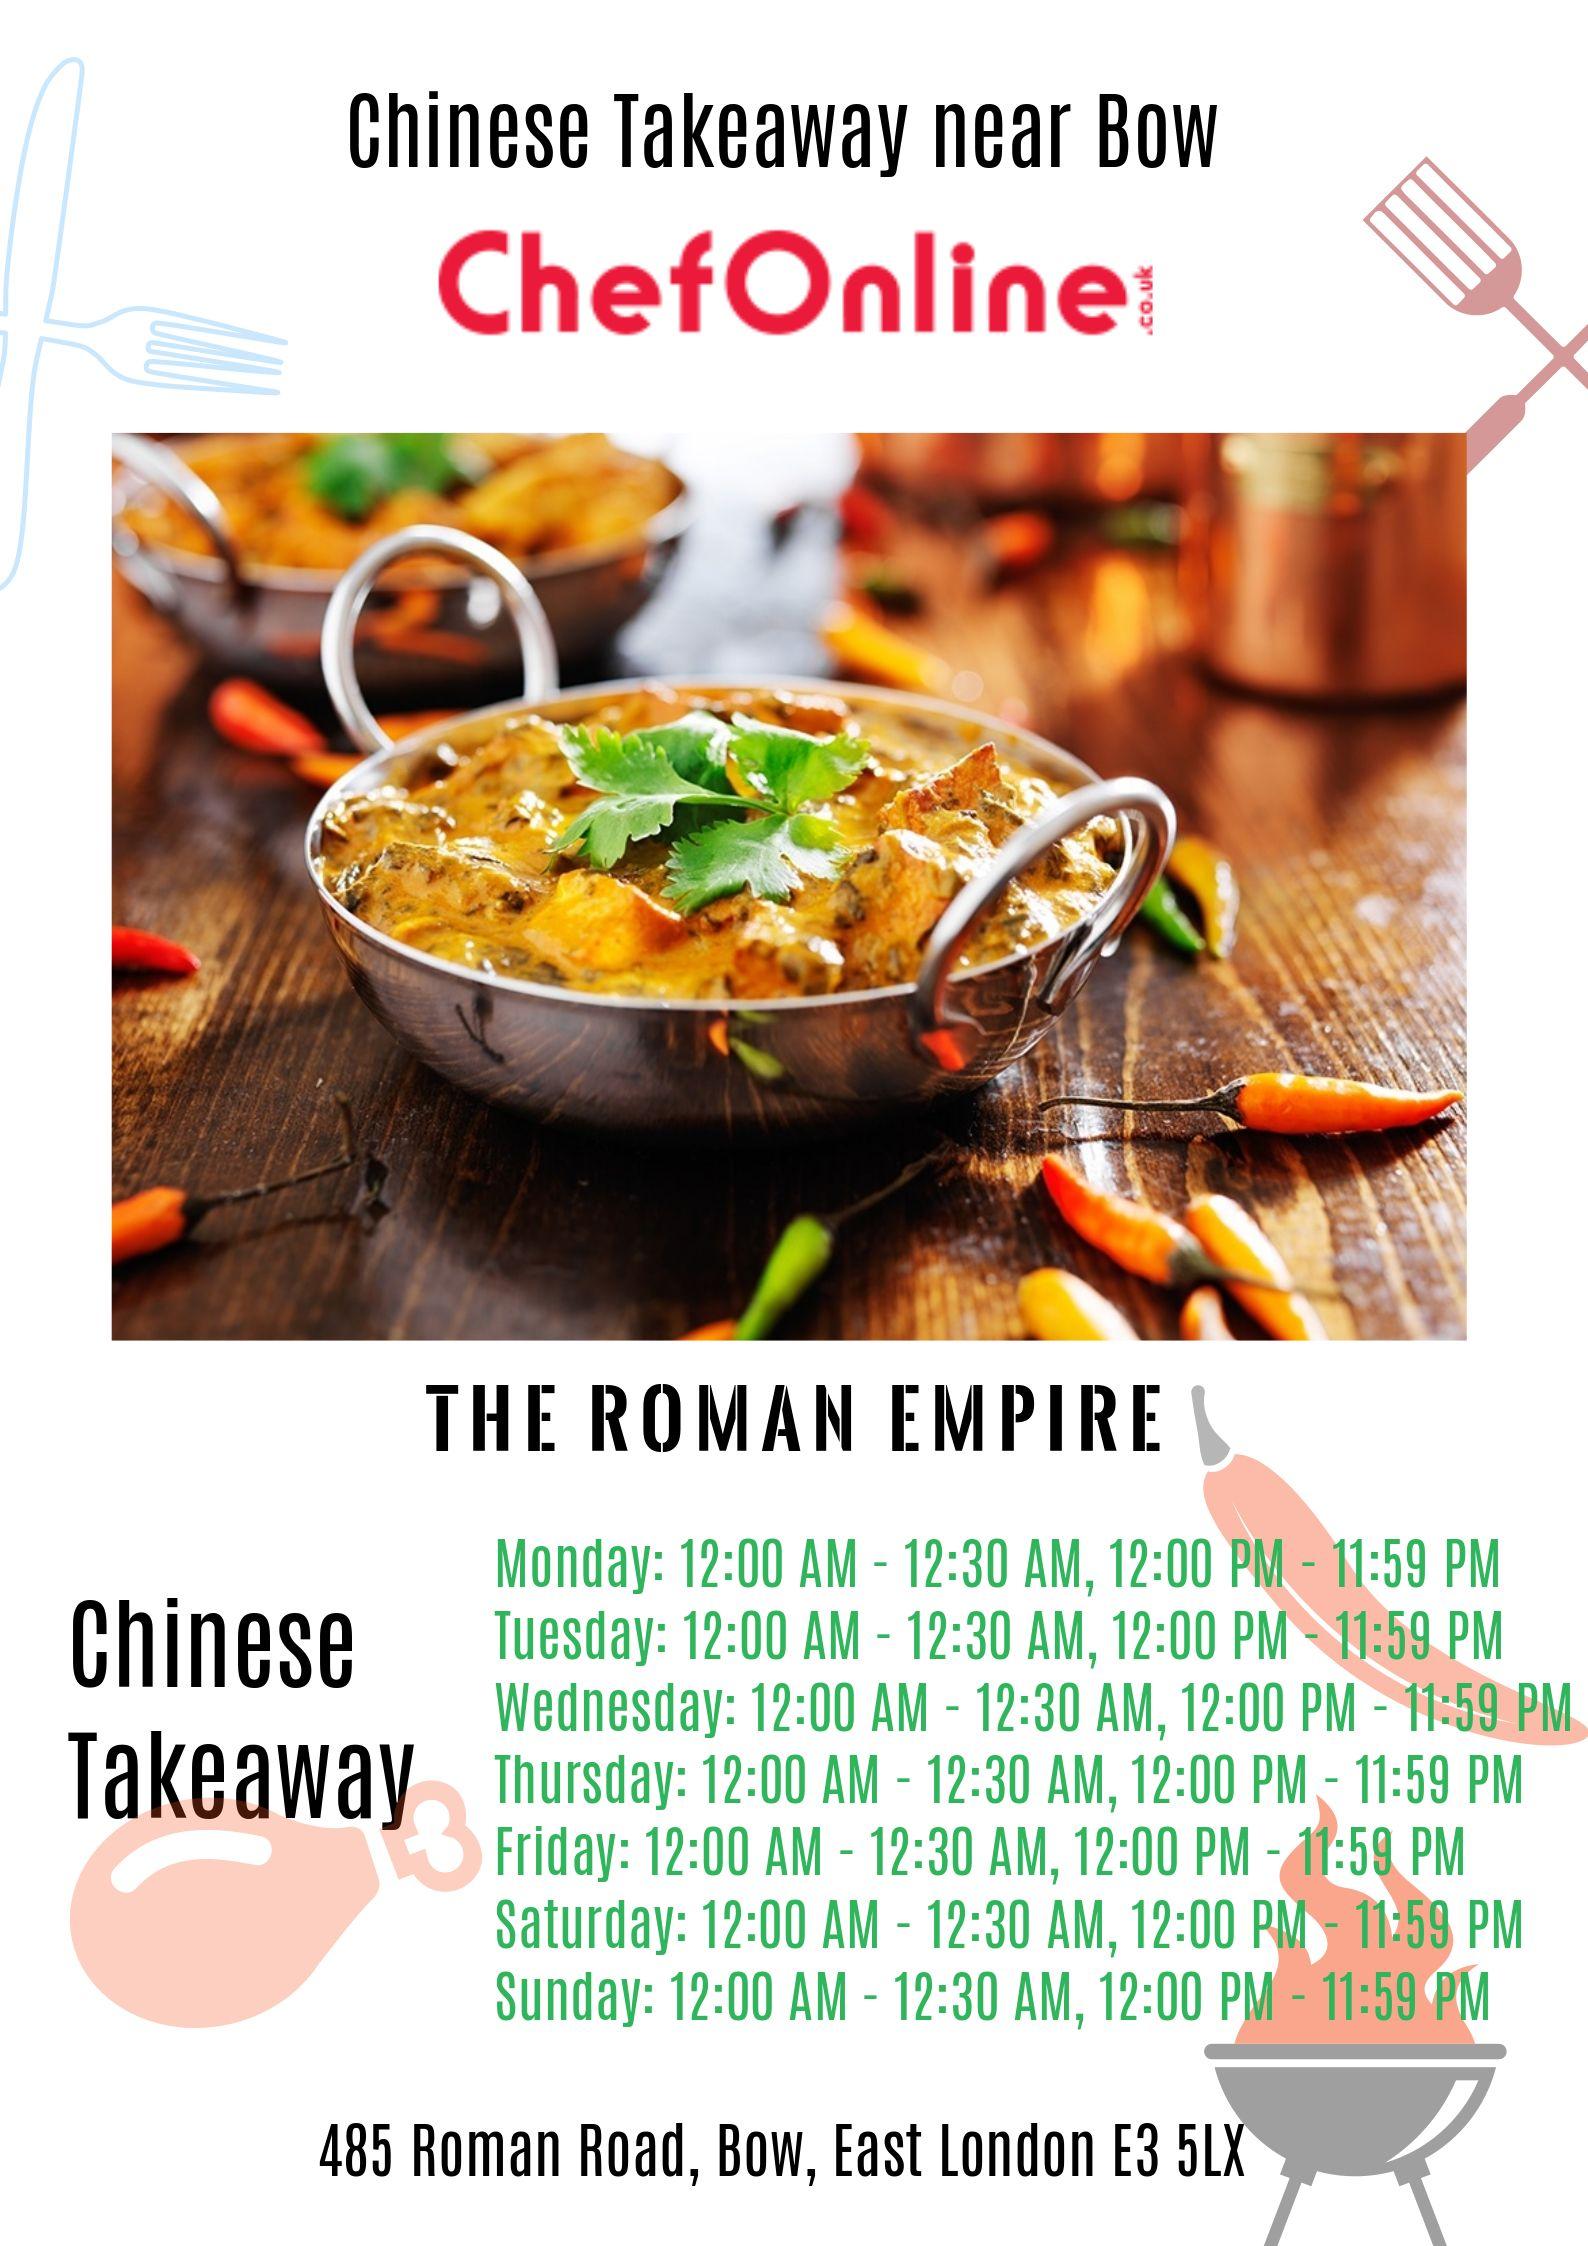 Chinese Takeaway Near Bow The Roman Empire Indian Food Recipes Italian Takeaway Order Takeaway